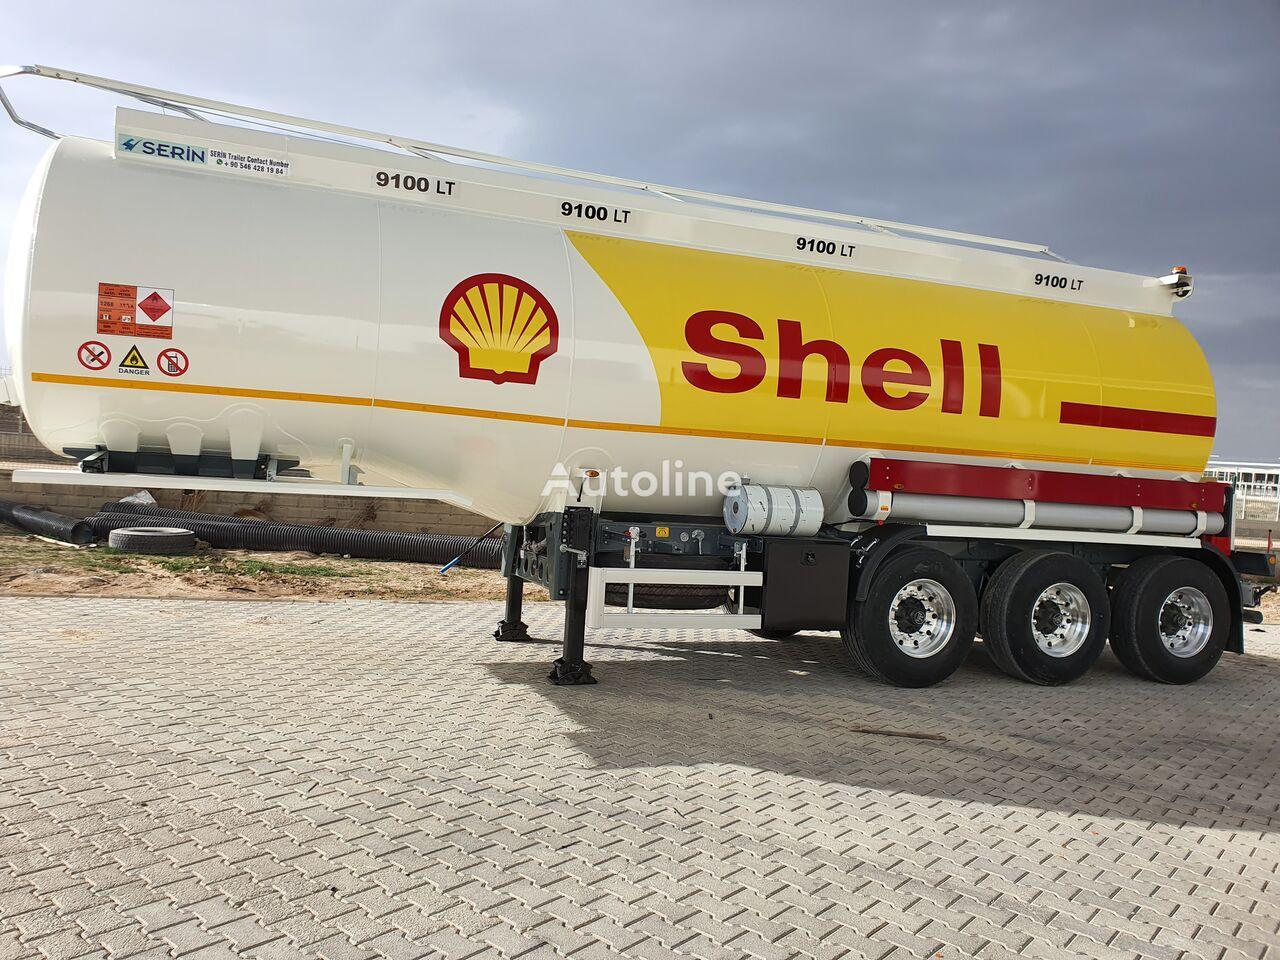 new SERIN Aluminium Fuel Tank Semi Trailer fuel tank trailer